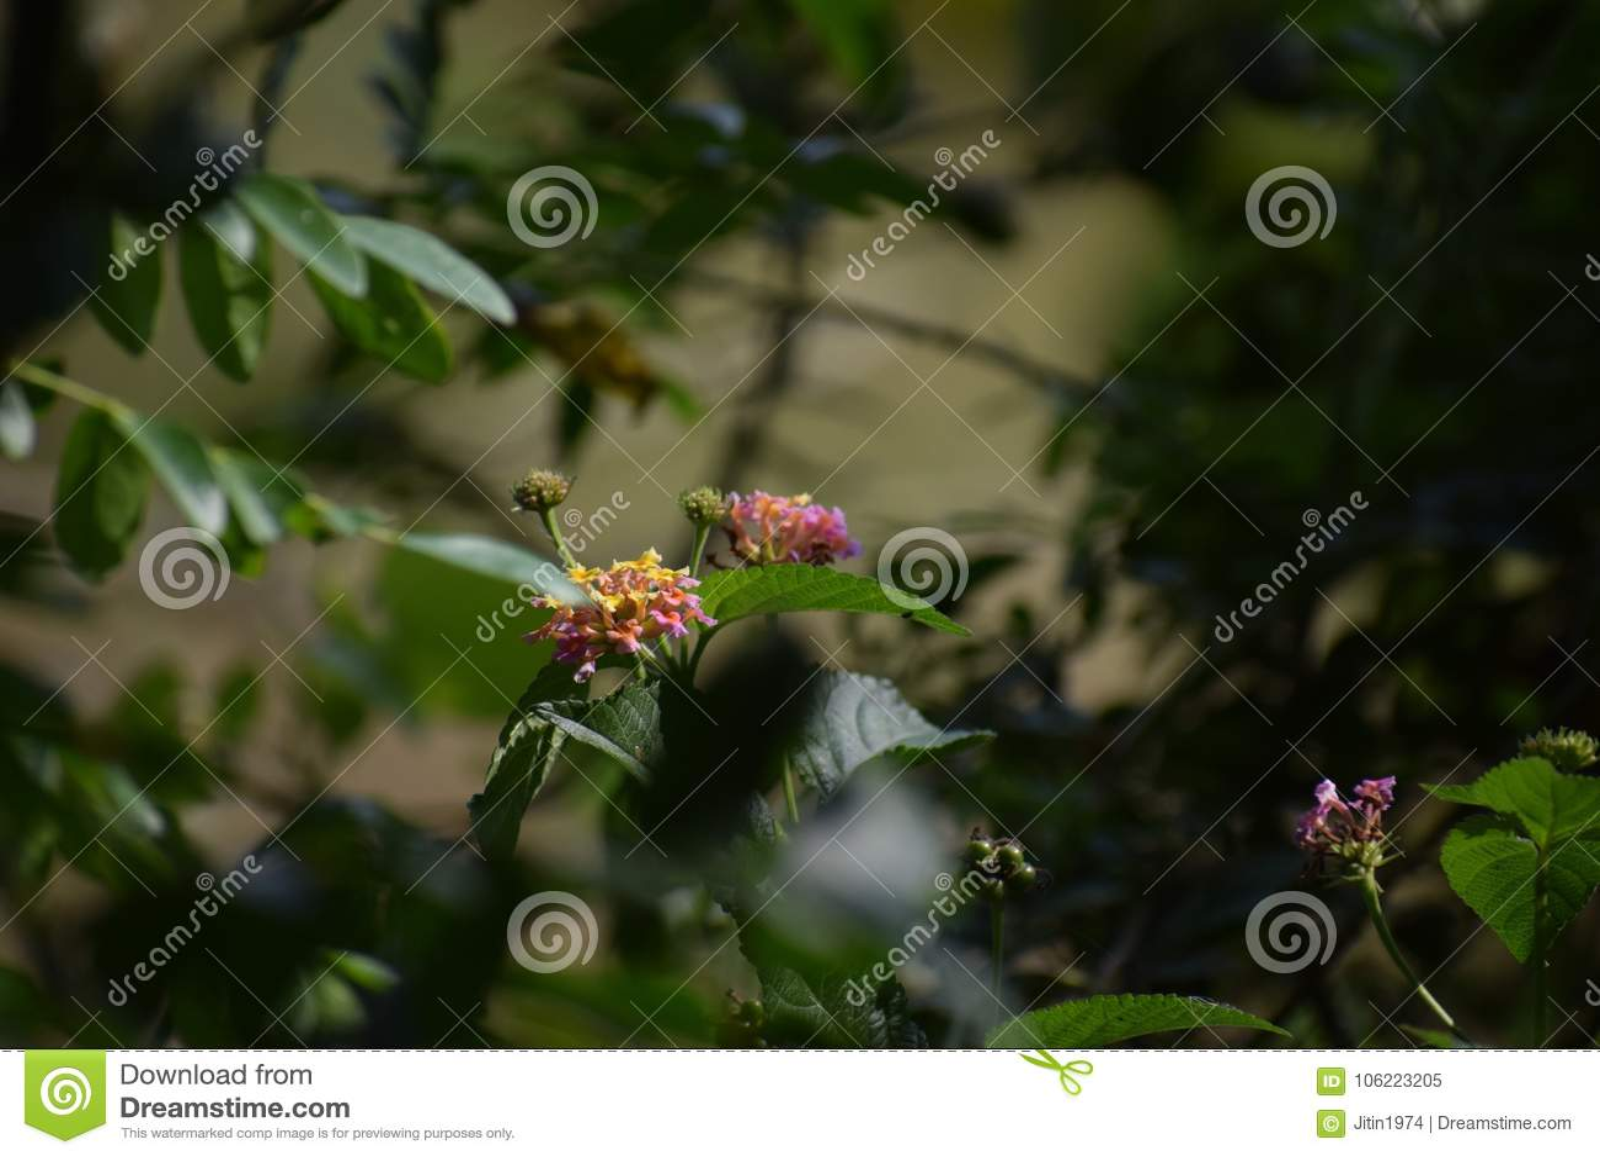 Beautifulwildflowernaturecoloursjoy stock image image of download beautifulwildflowernaturecoloursjoy stock image image izmirmasajfo